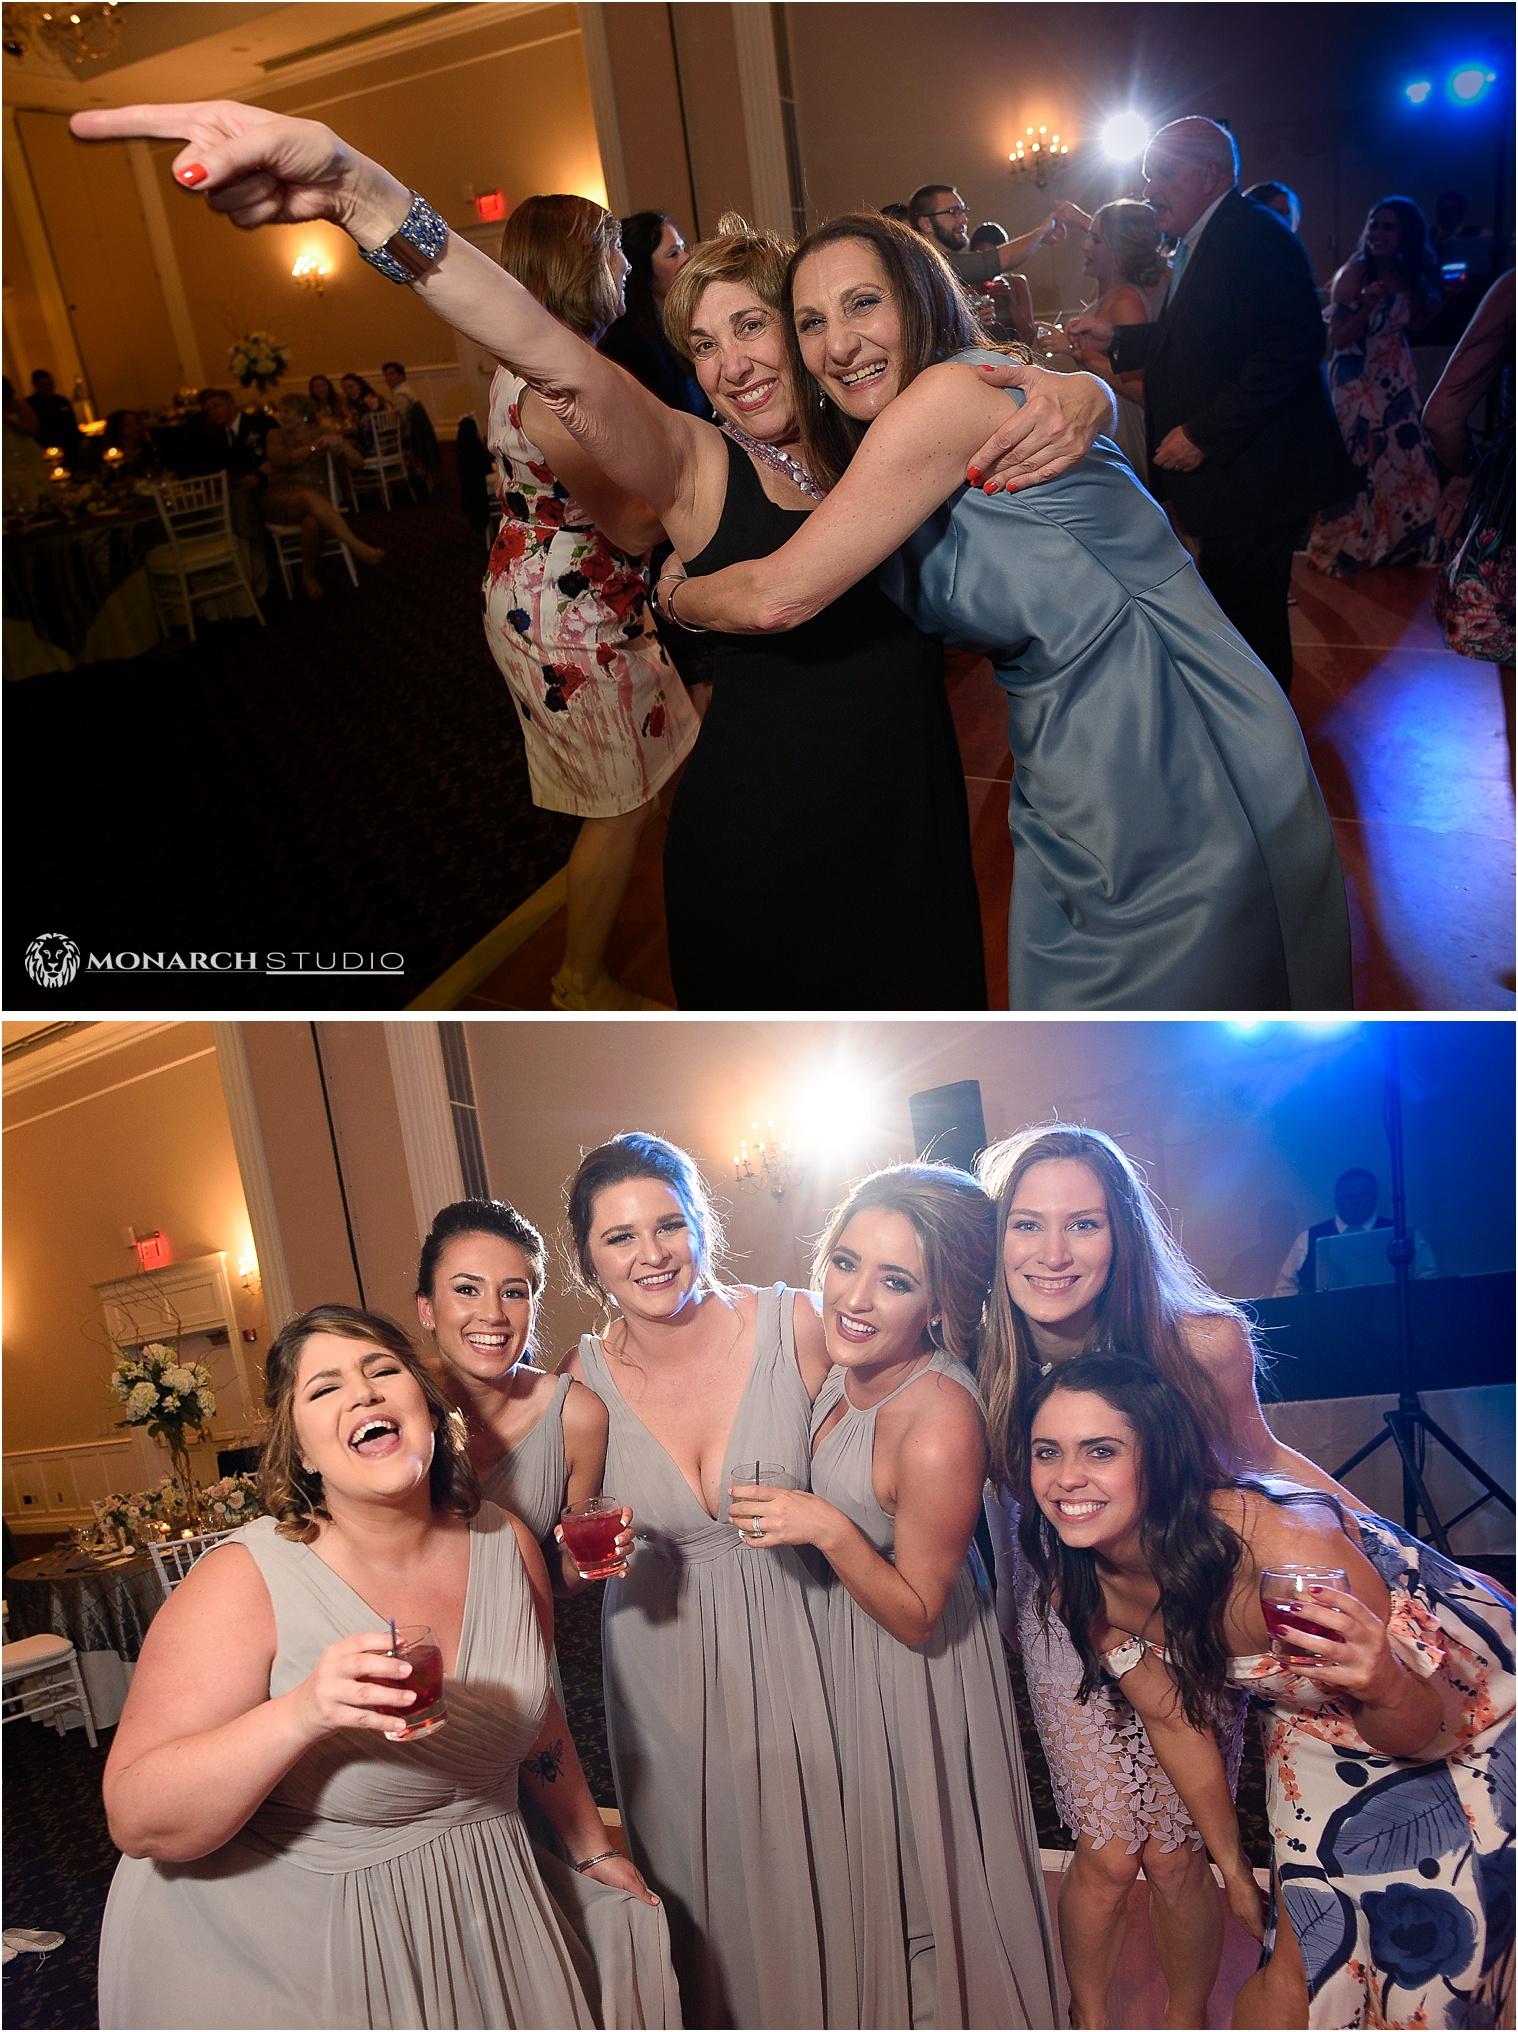 williamsburg-virginia-wedding-photographer-131.jpg